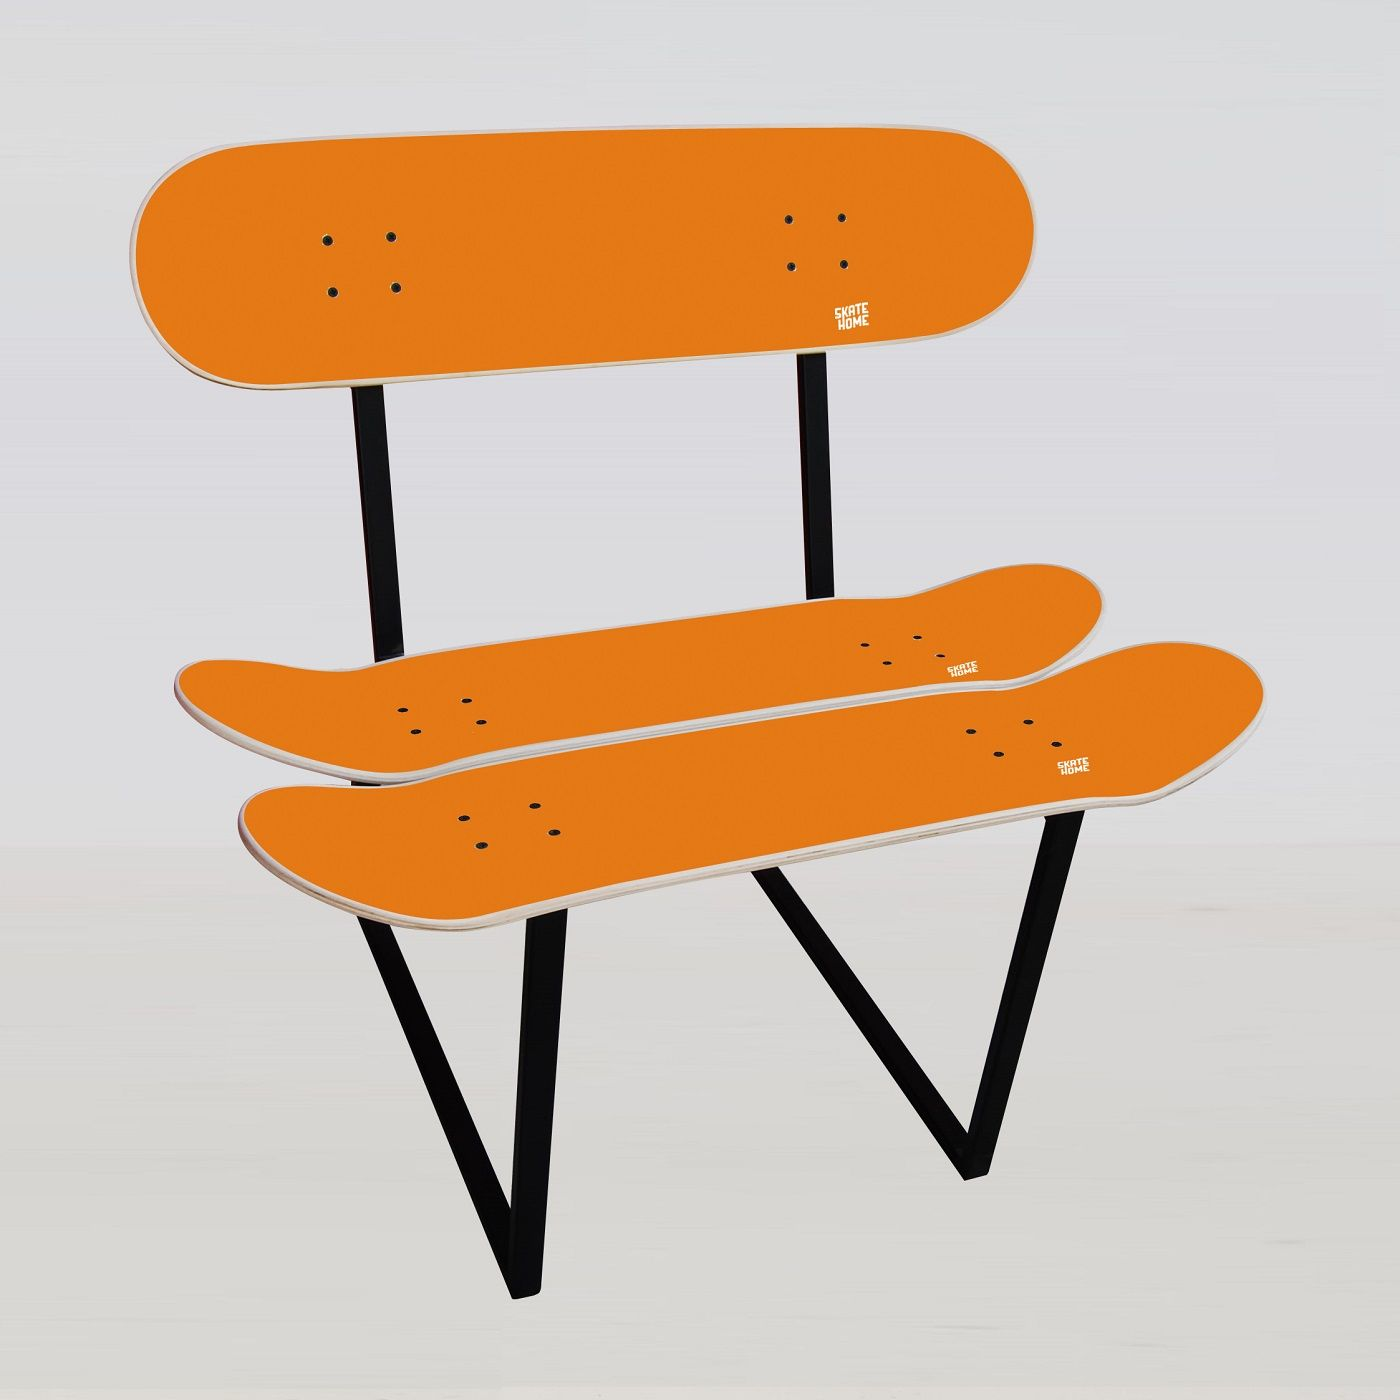 Childrenu0027s Skateboard Furniture Kids Chair With 3 Skate Decks   Original  Present For Skaters